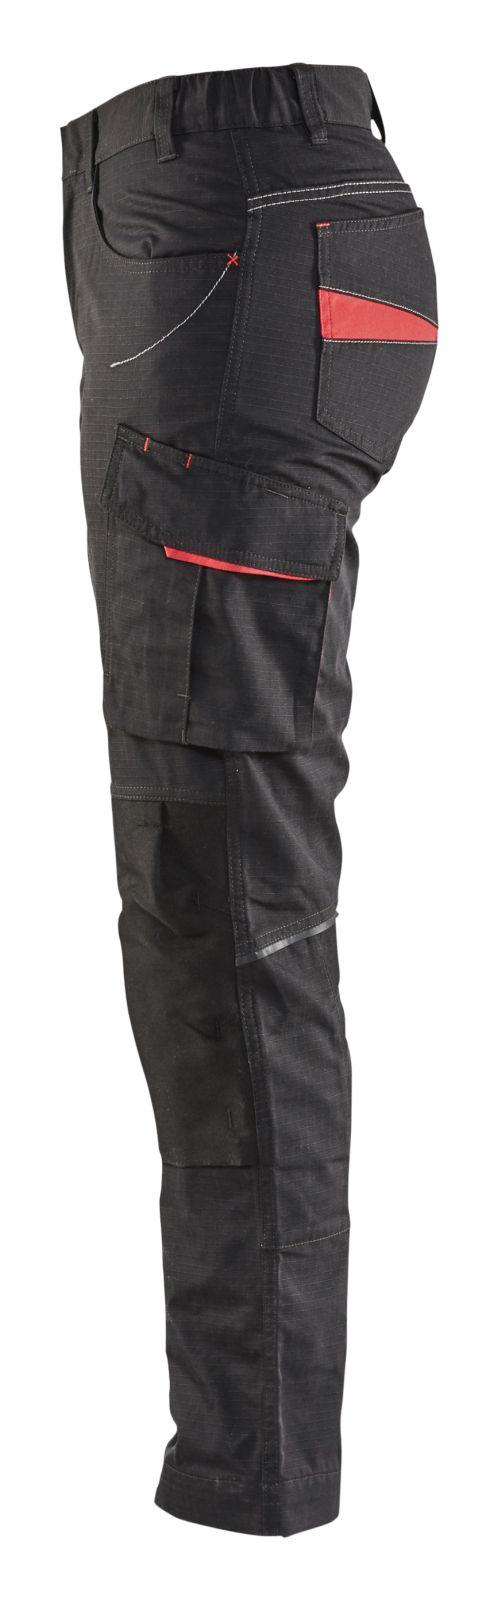 Blaklader Dames werkbroeken 71951330 zwart-rood(9956)